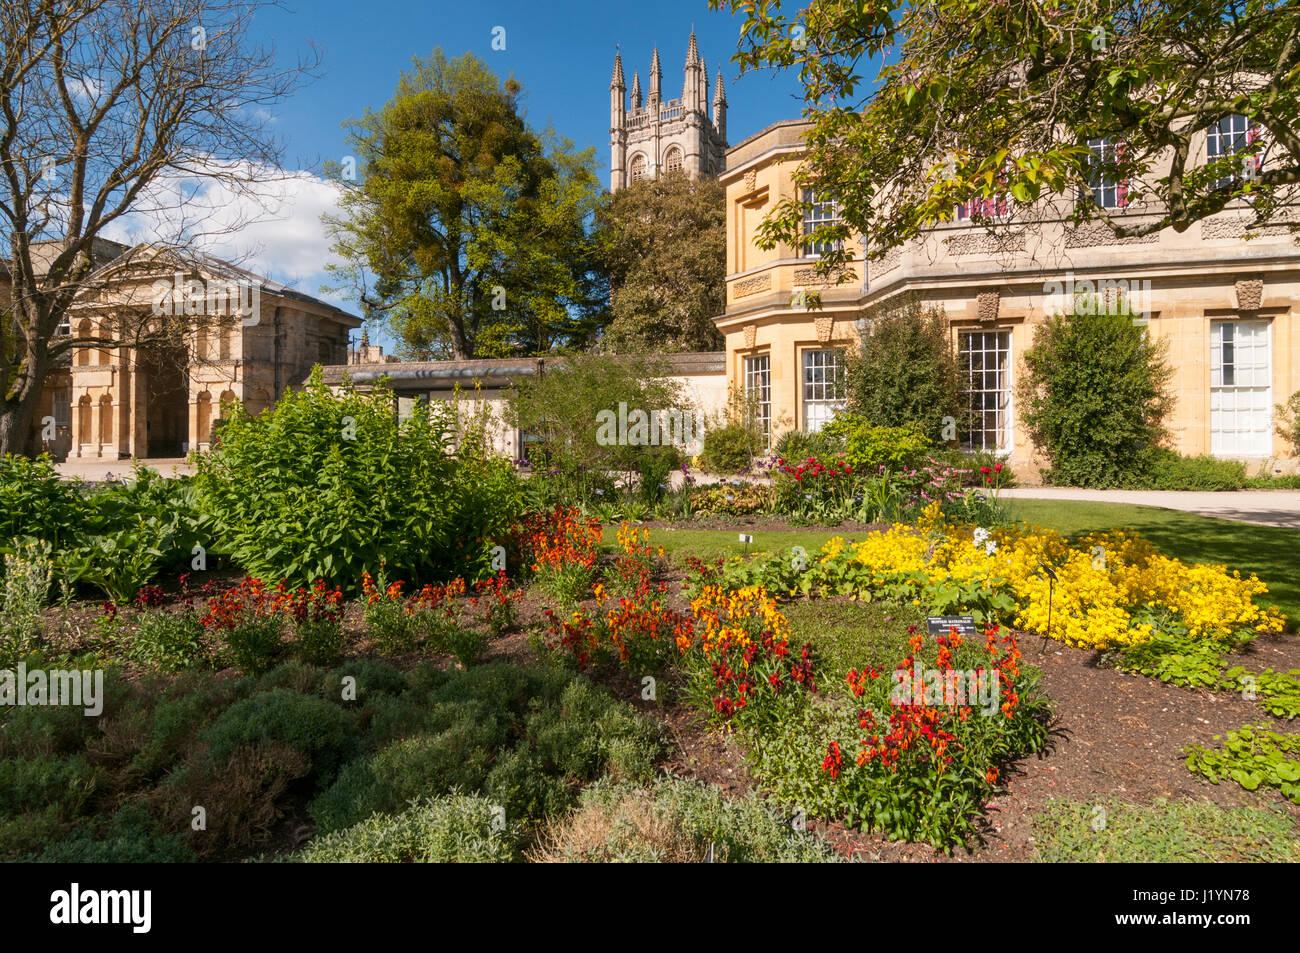 Oxford, Oxfordshire, UK. 22nd Apr, 2017. UK Weather, Oxford, Oxfordshire, UK. 22nd April 2017, People enjoy sunny Stock Photo